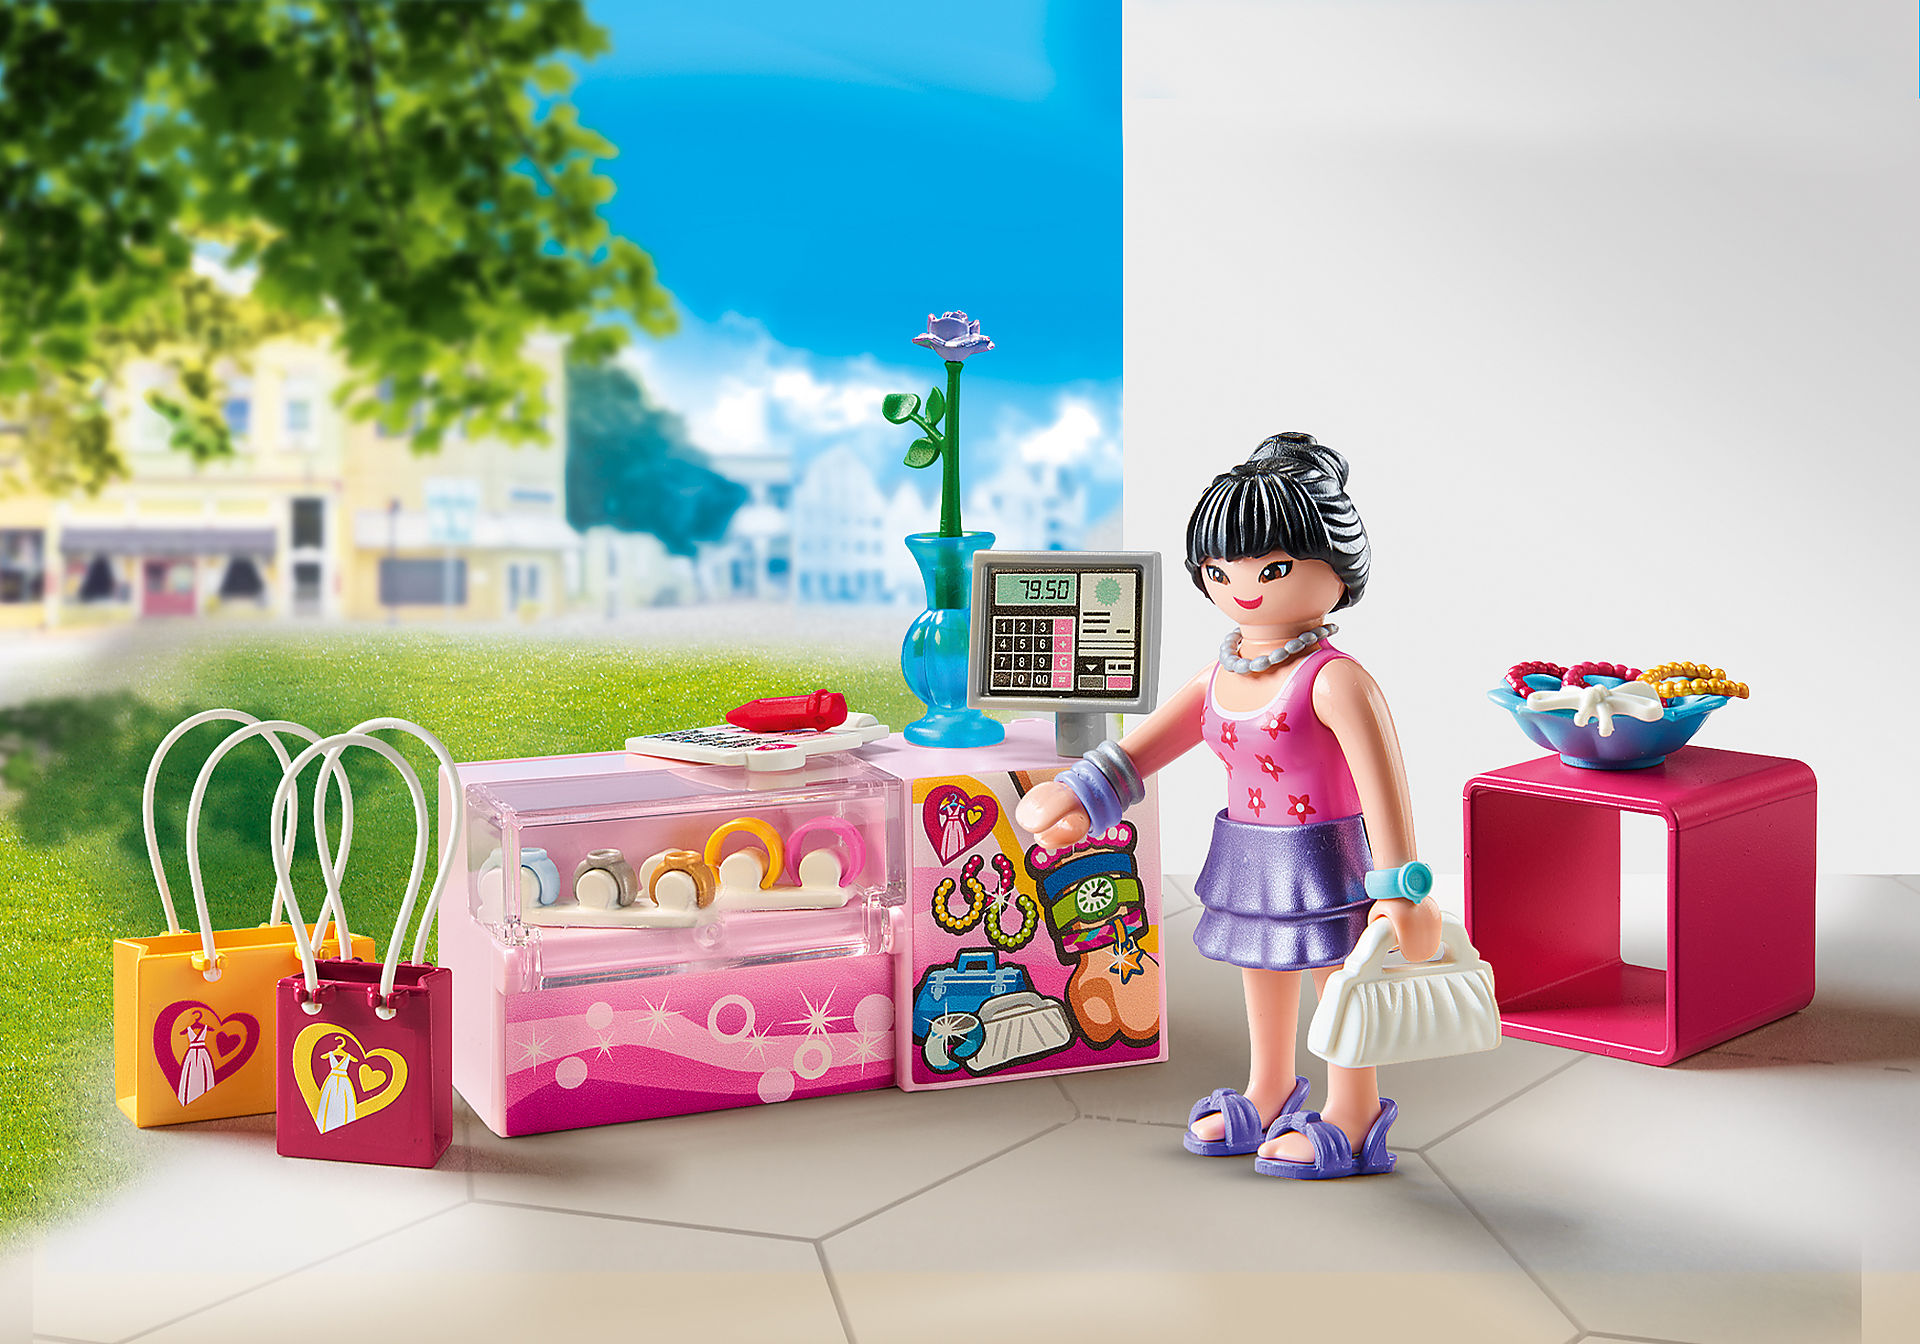 70594 Fashion Accessories zoom image1